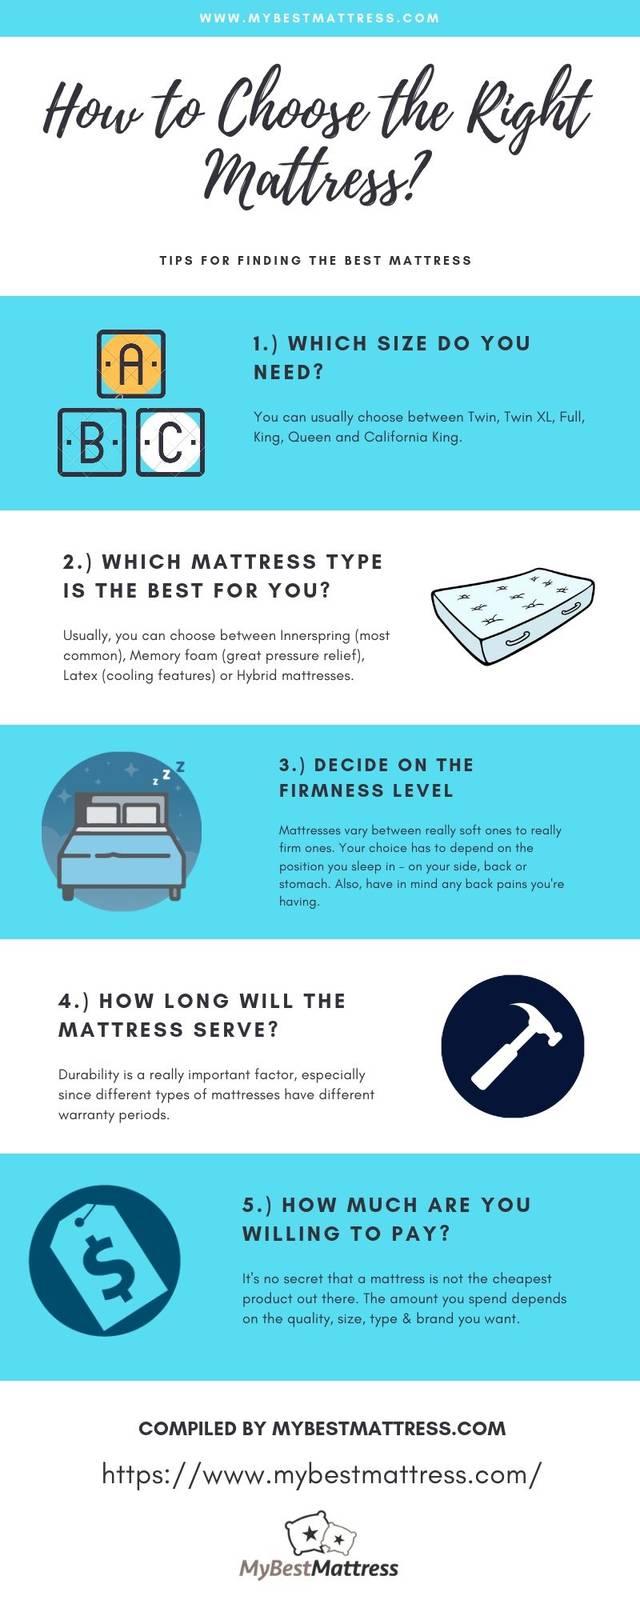 How to choose the right mattress my best mattress